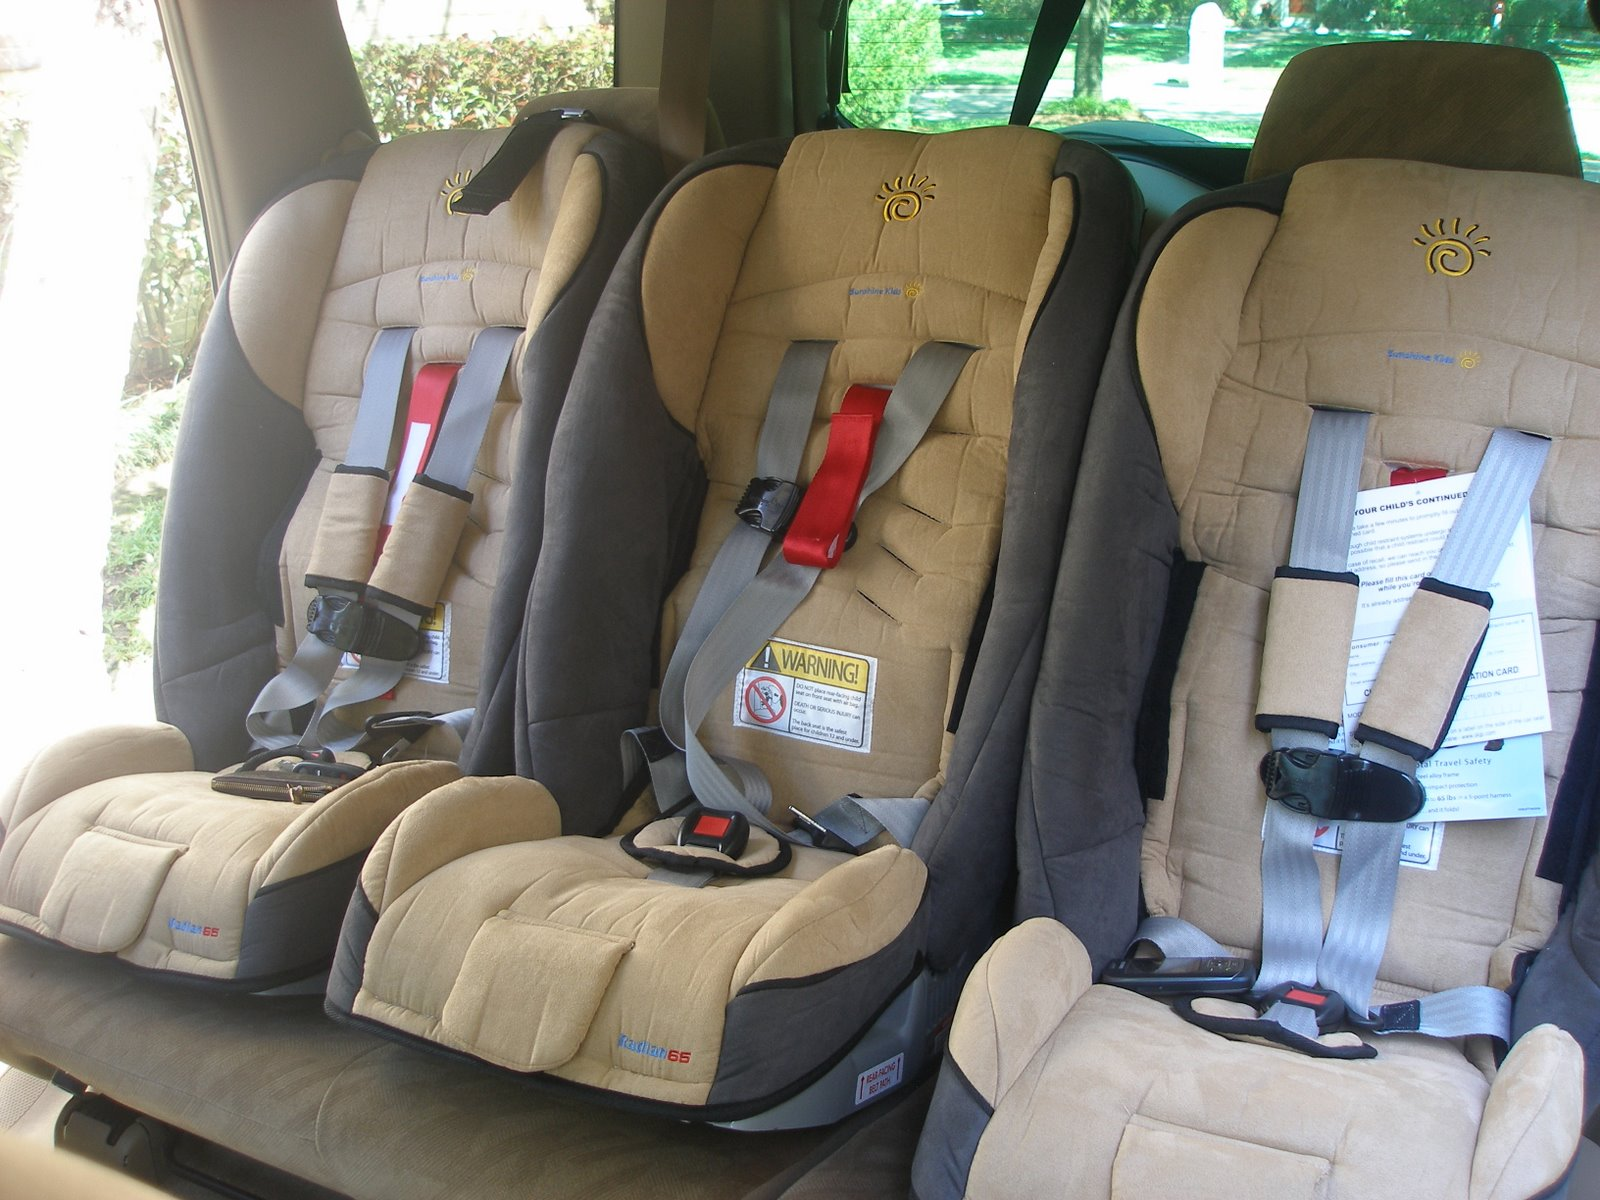 Thinnest Infant Car Seat